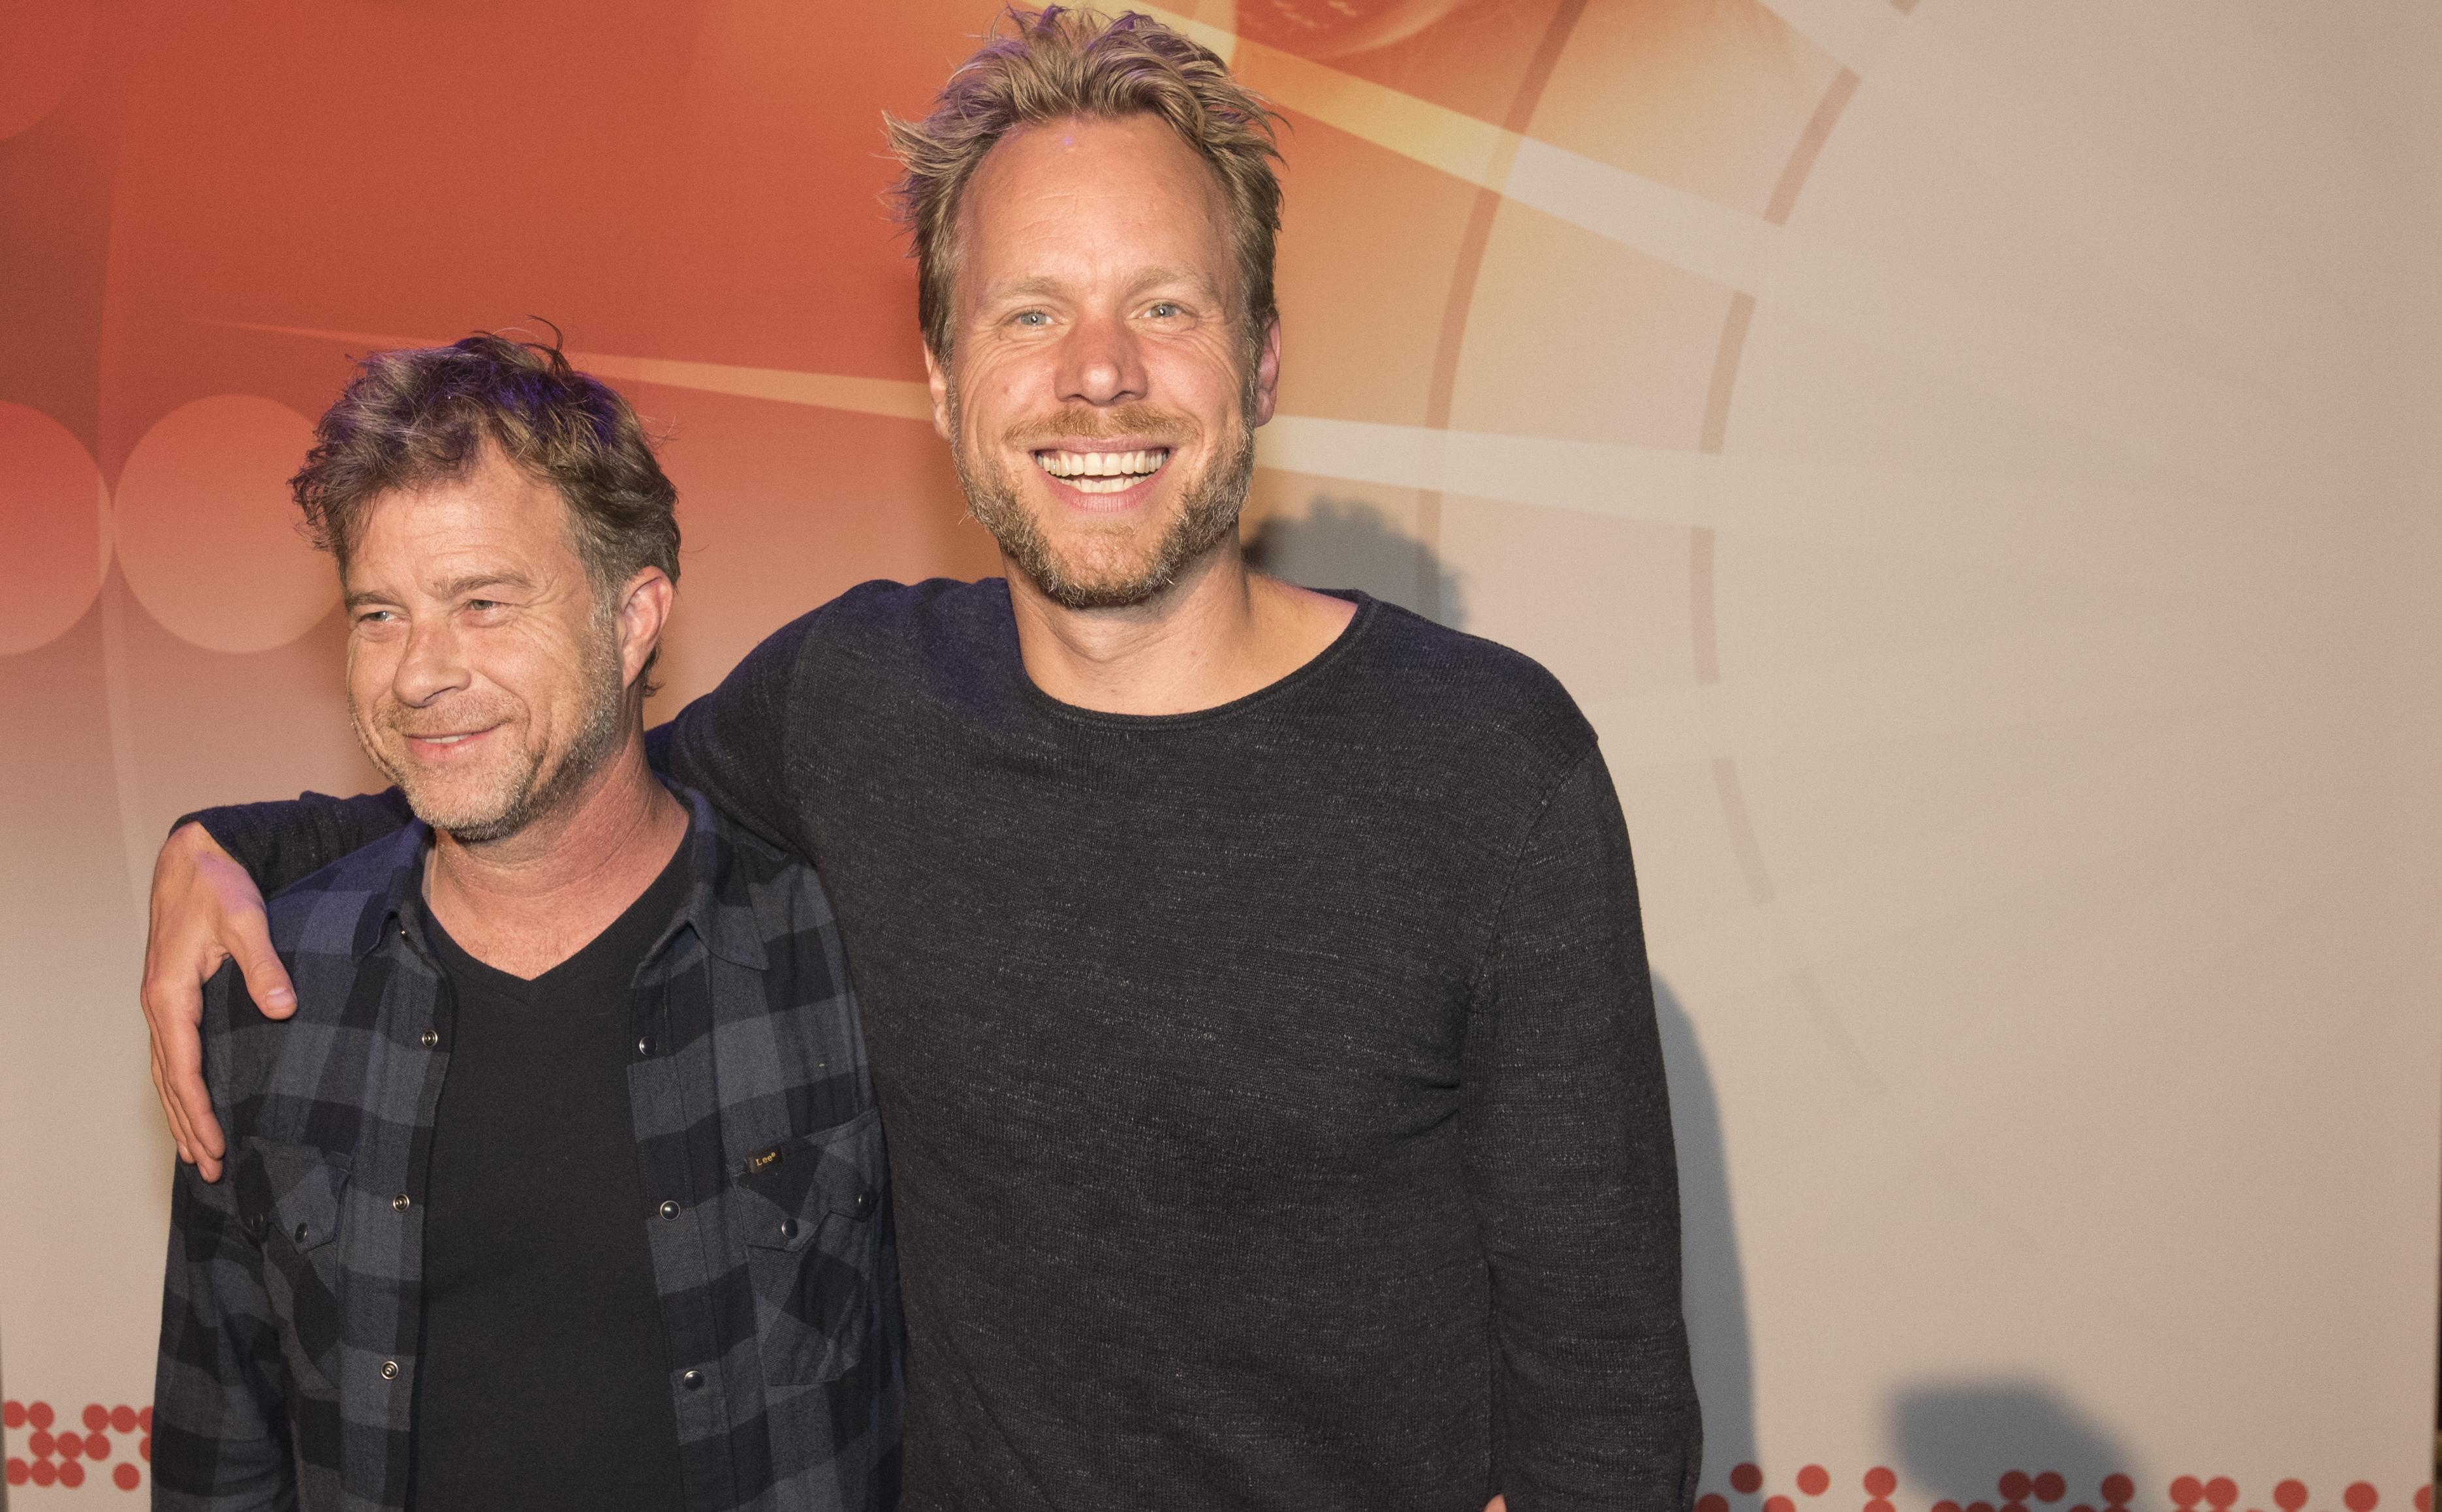 Diggy Dex en JW Roy tijdens Buma NL Awards 2017 - Fotocredits: Shali Blok (ArtiestenNieuws)